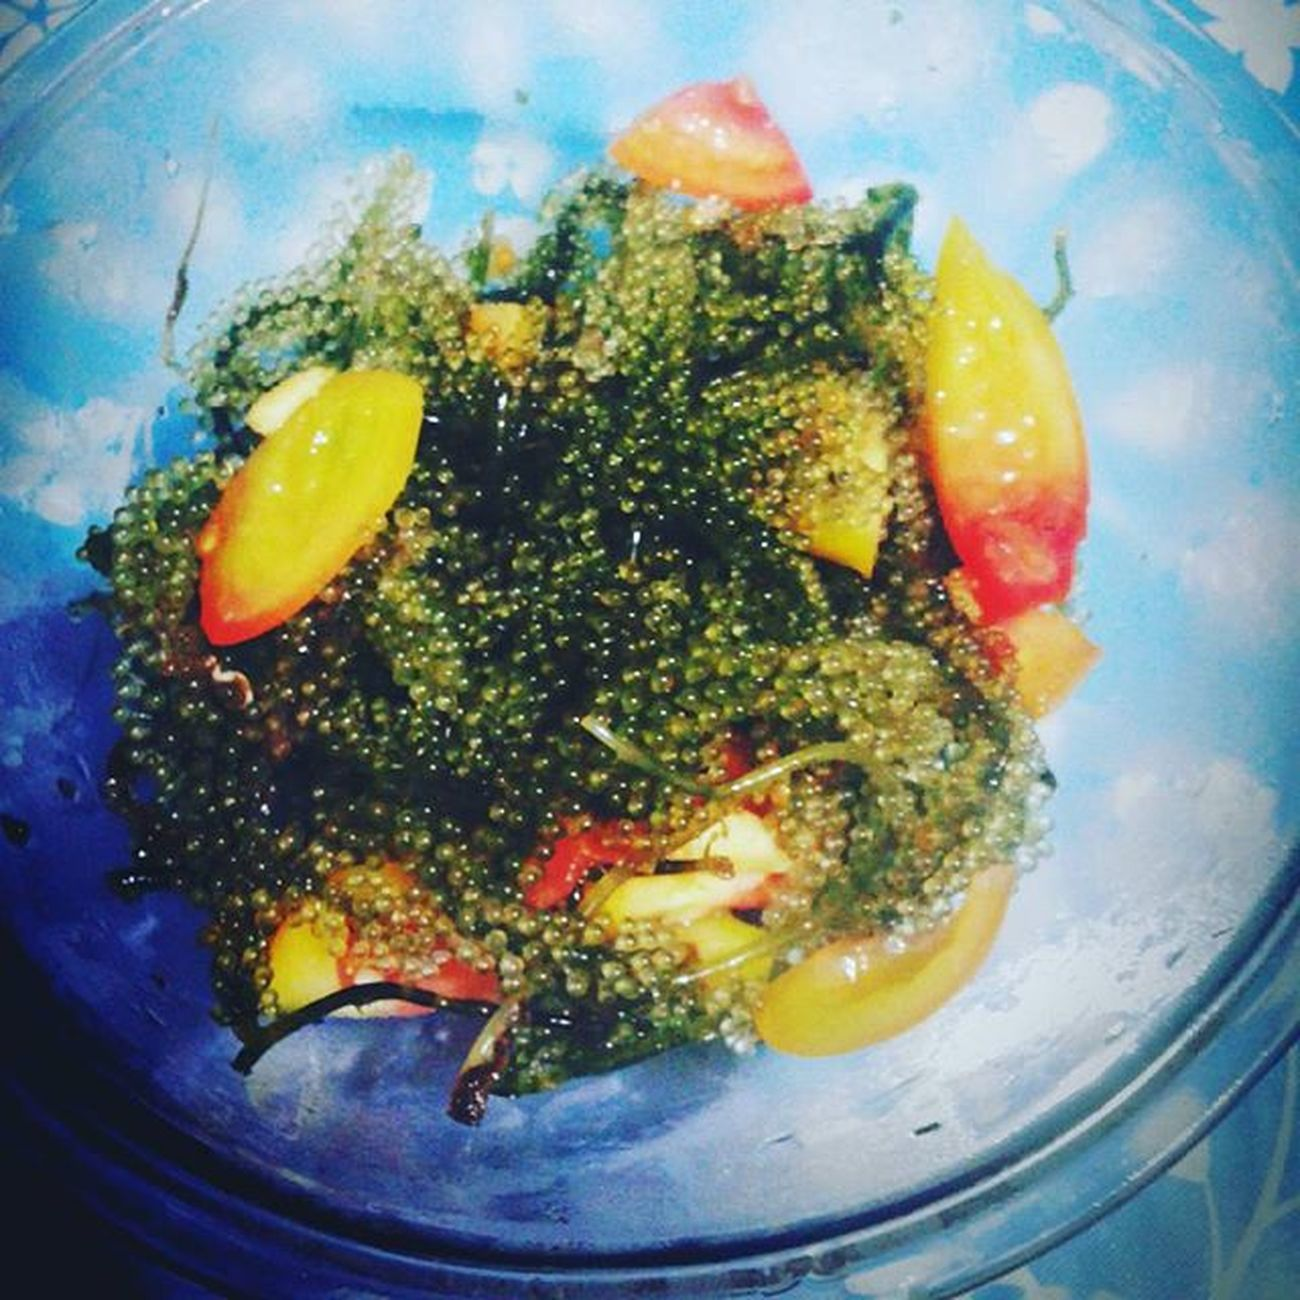 Now eating : Ar-arosep? Wahahahahaa di ko alam. Halamangdagat Seaweedsalad